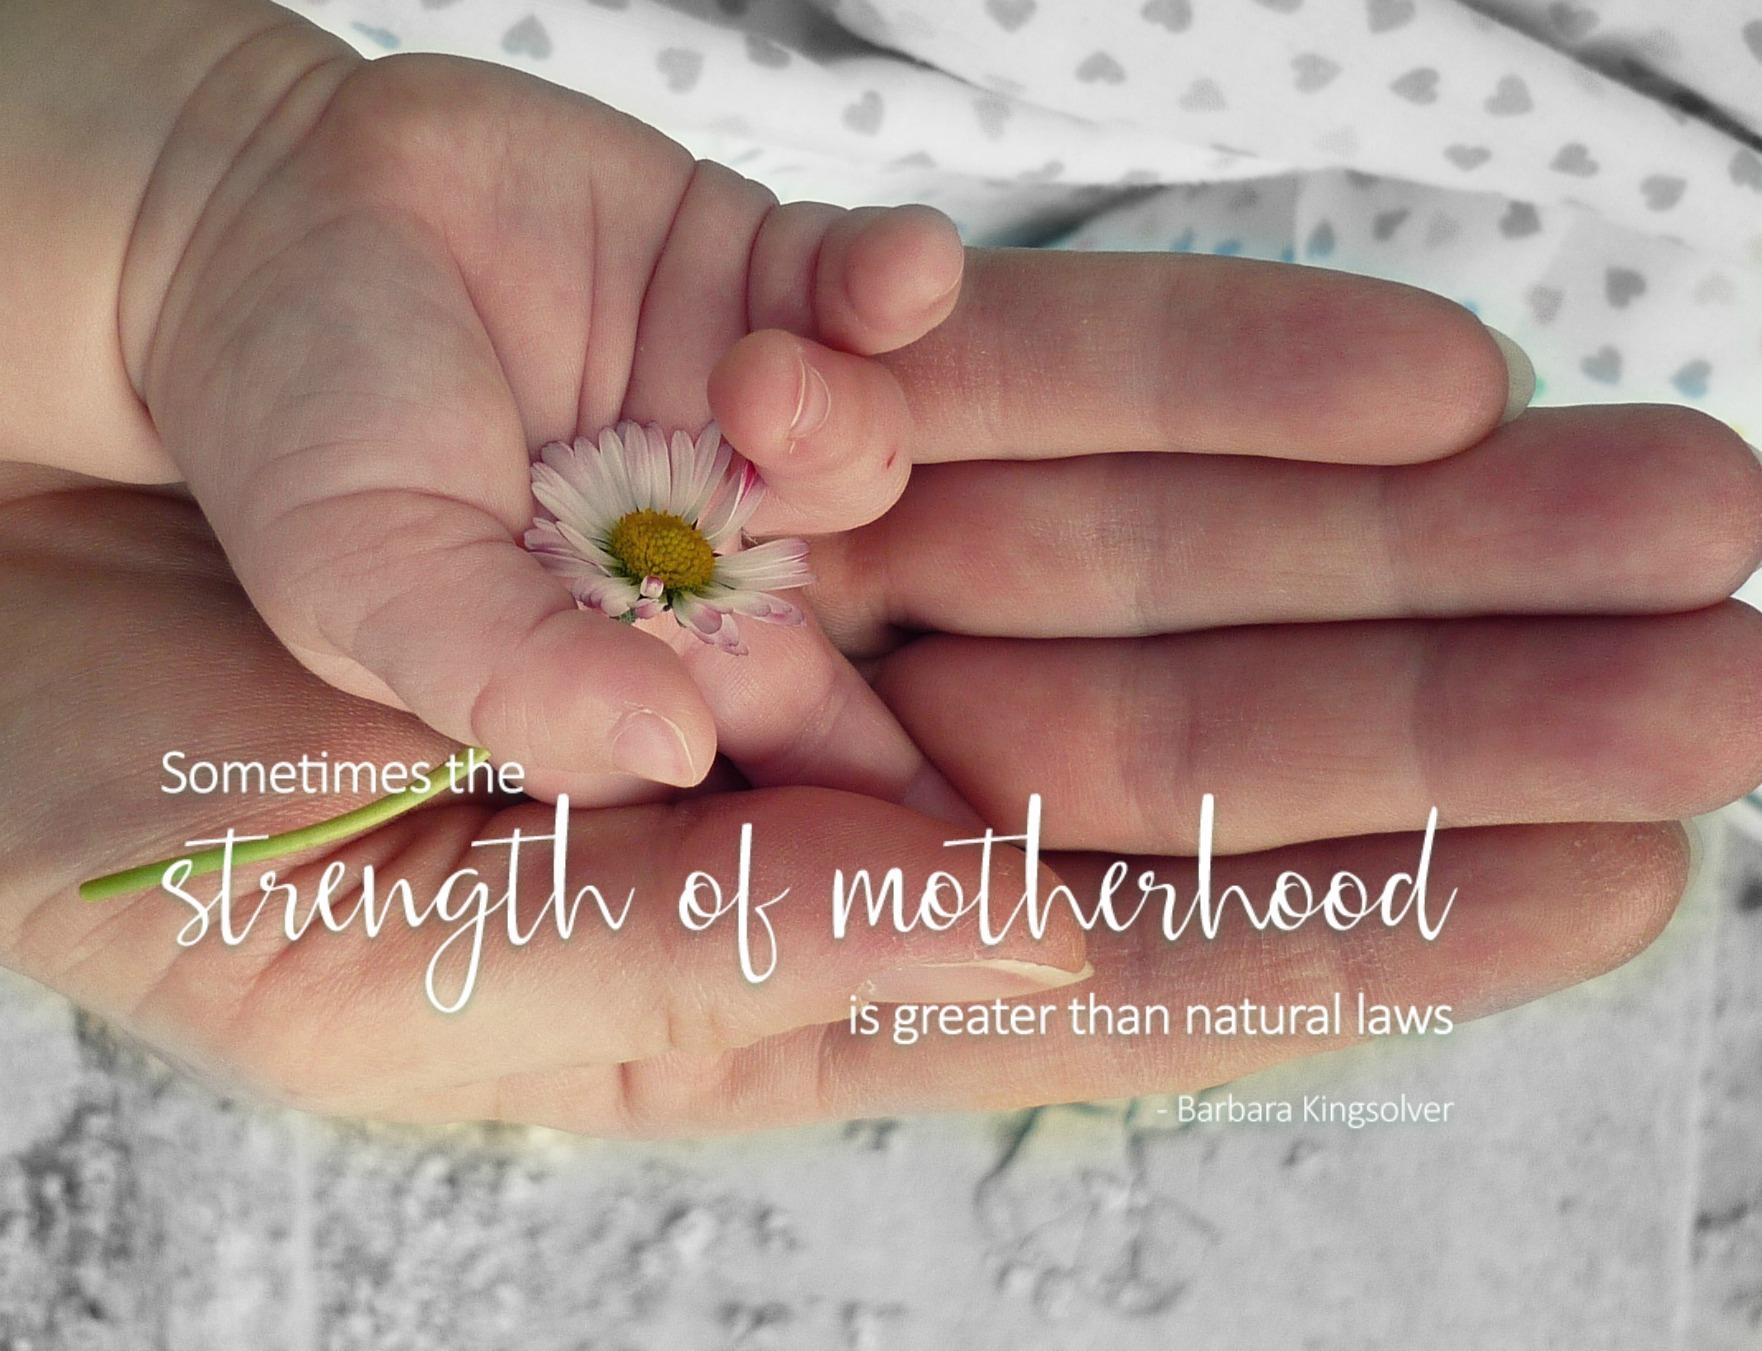 strengthofmotherhood